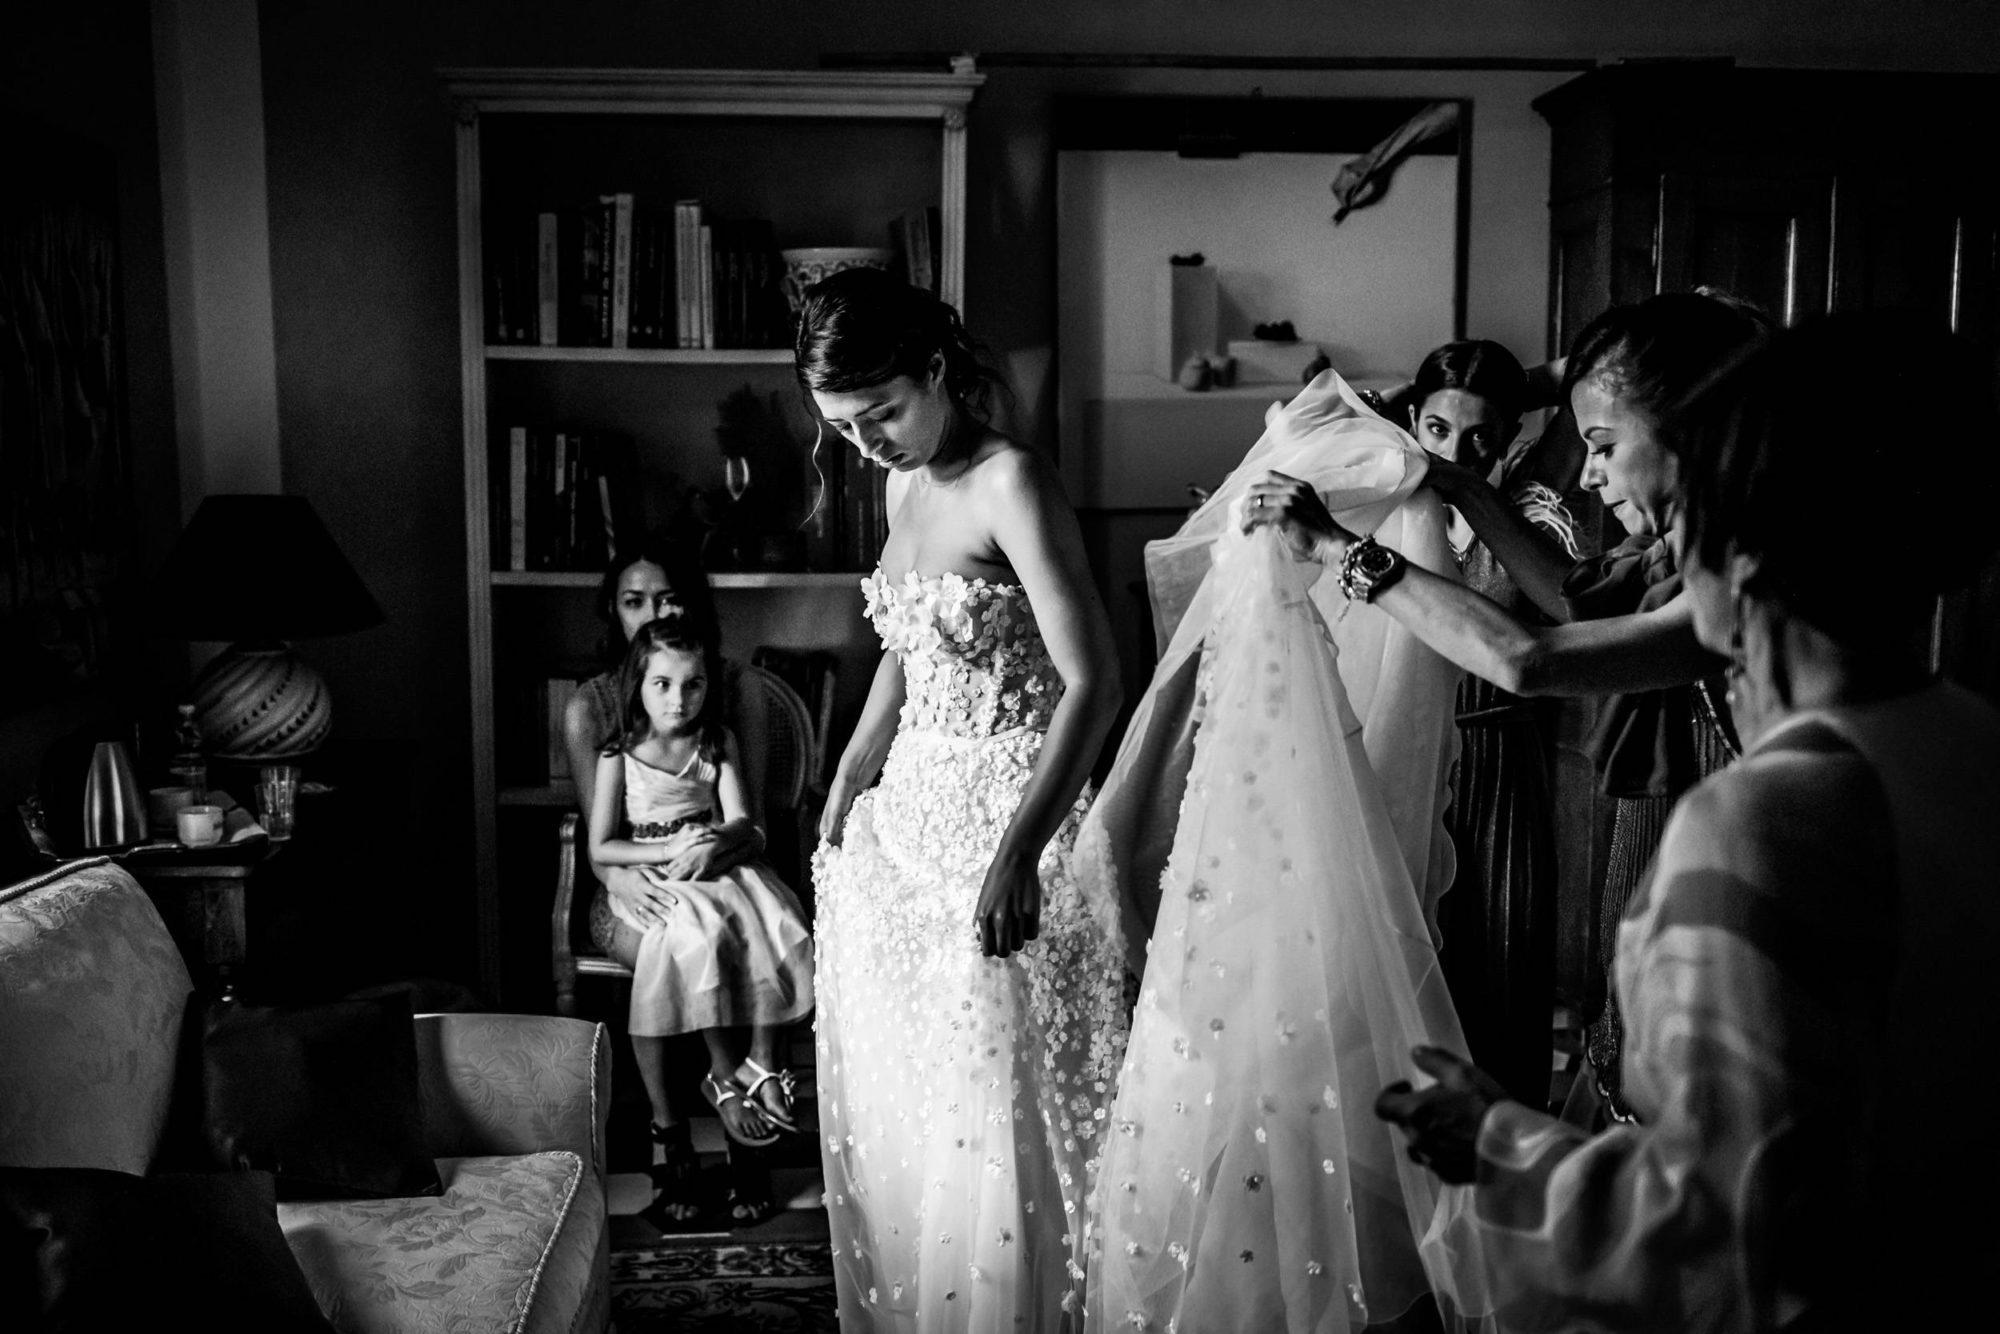 matrimonio_villa-ferrari-gussola_MI-014